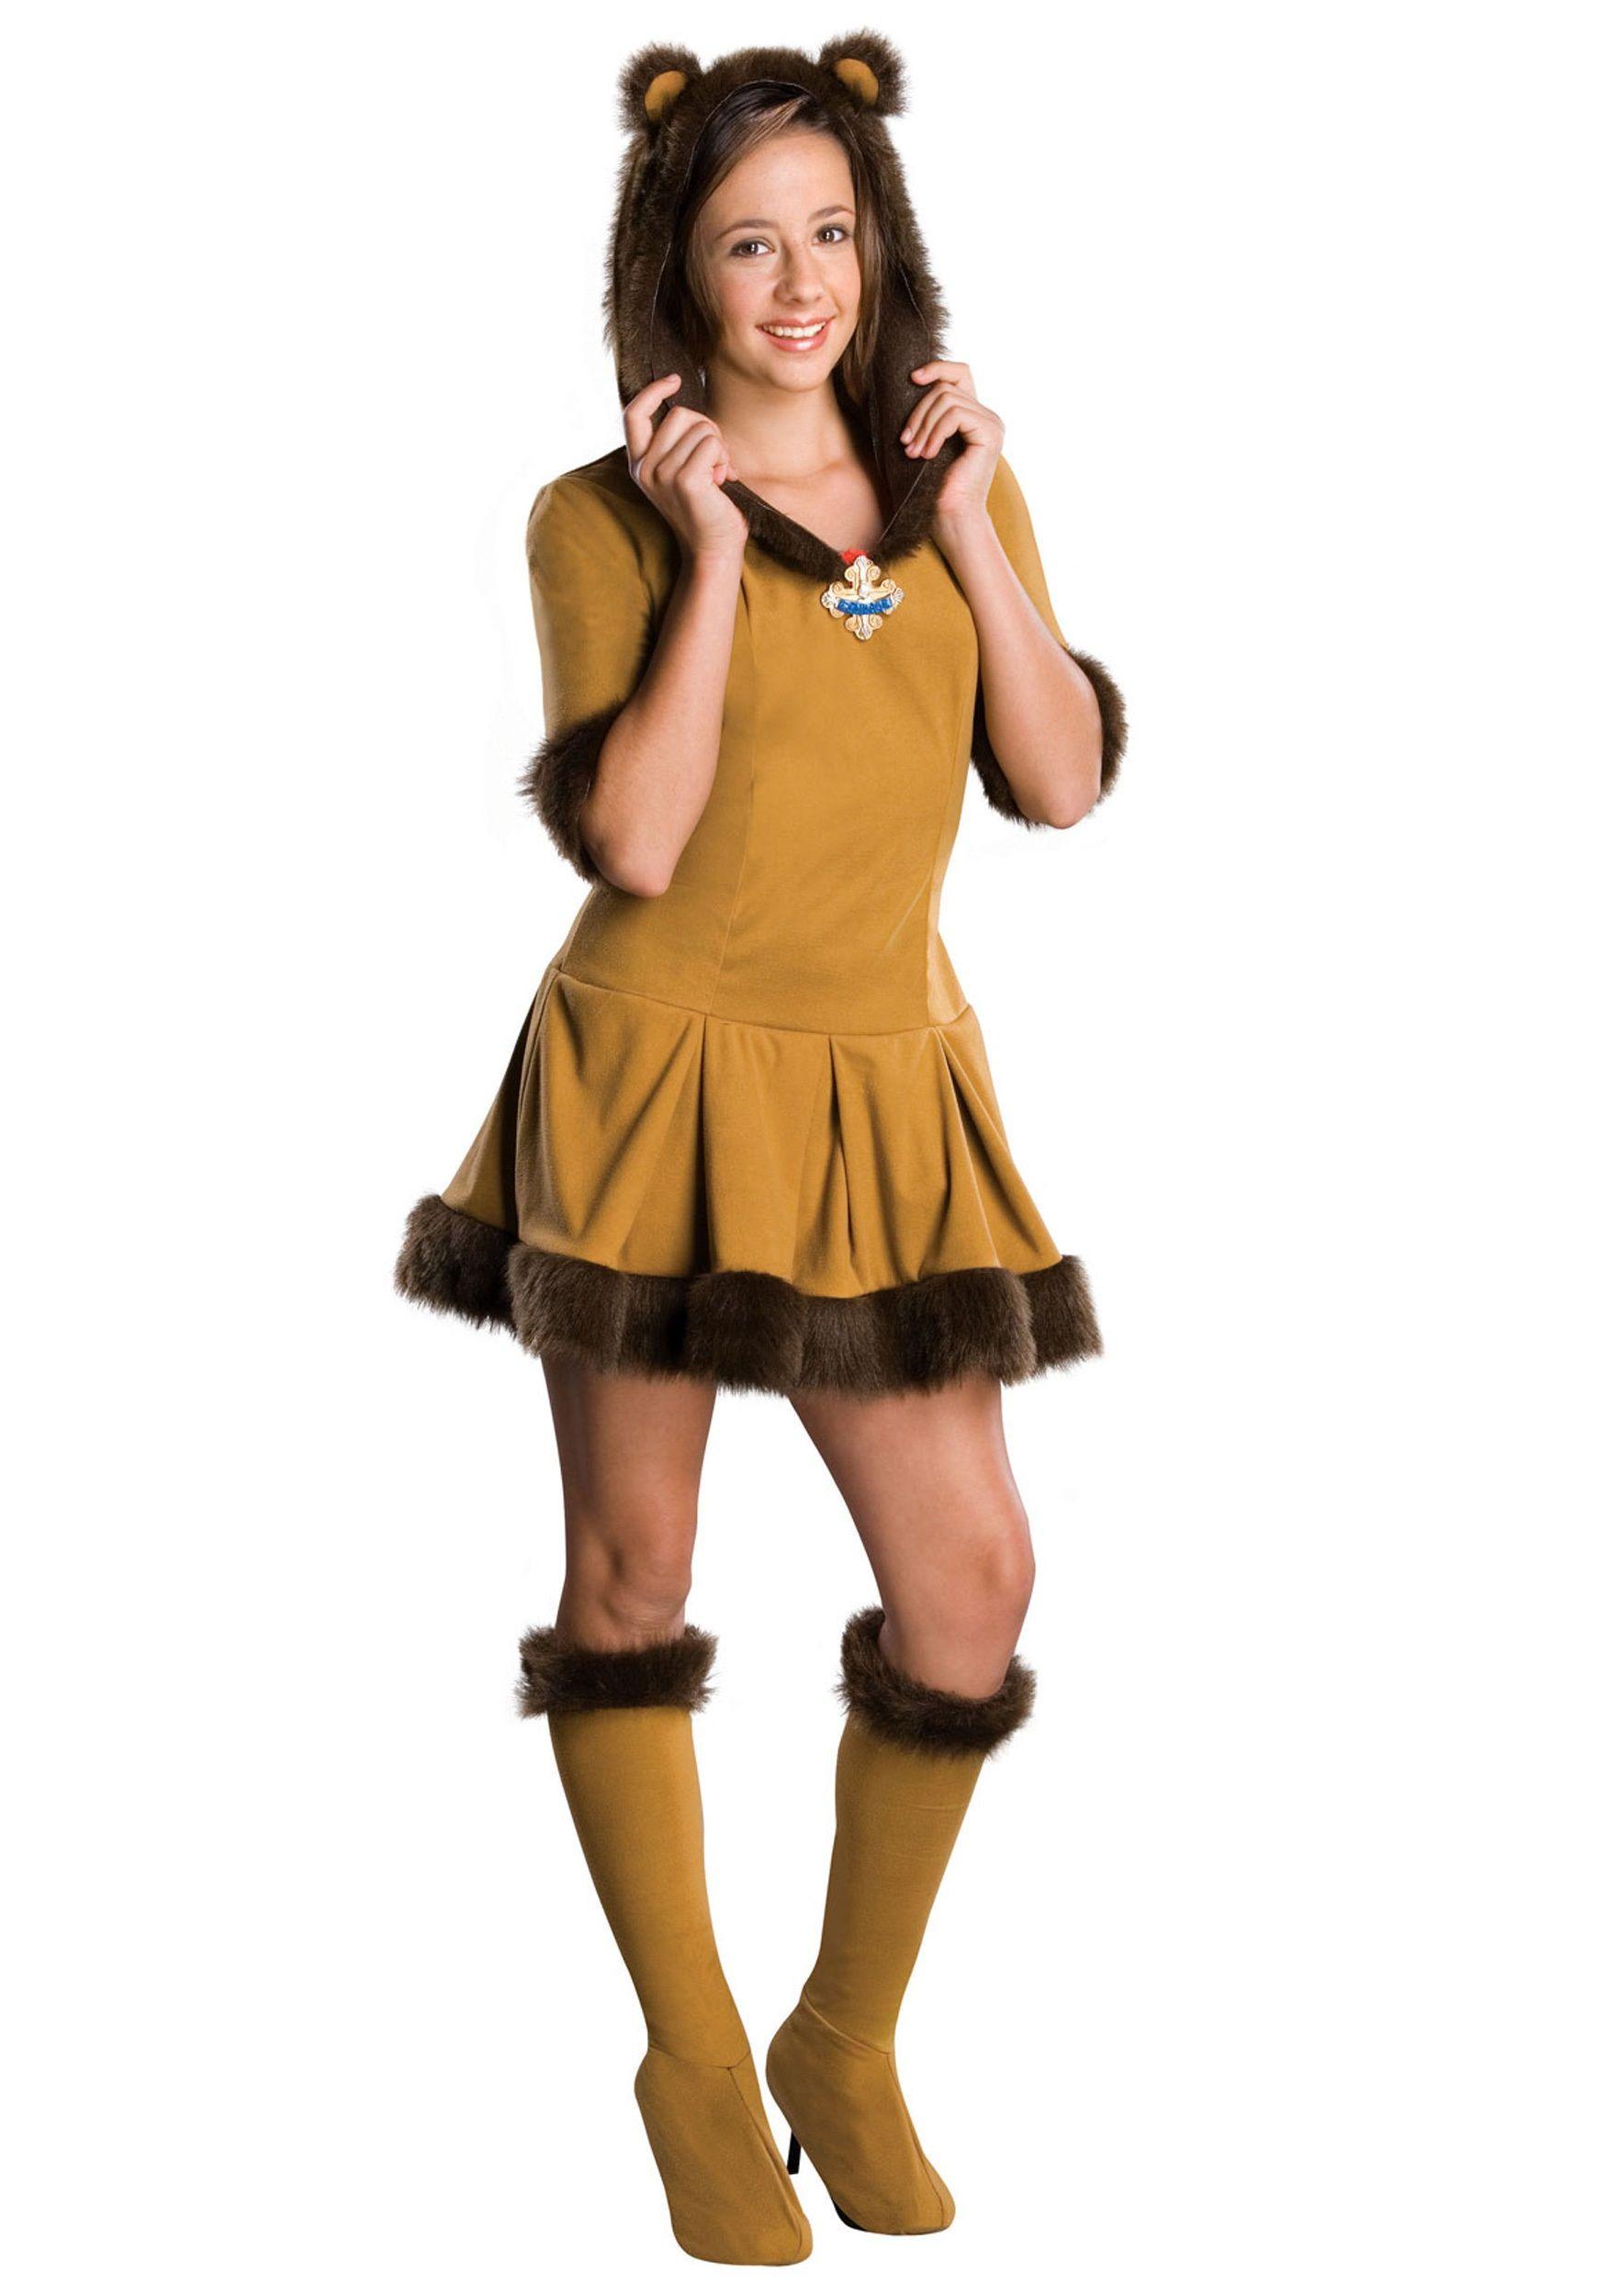 Teen Cowardly Lion Costume  sc 1 st  Pinterest & Teen Cowardly Lion Costume | Halloween Costumes | Pinterest ...